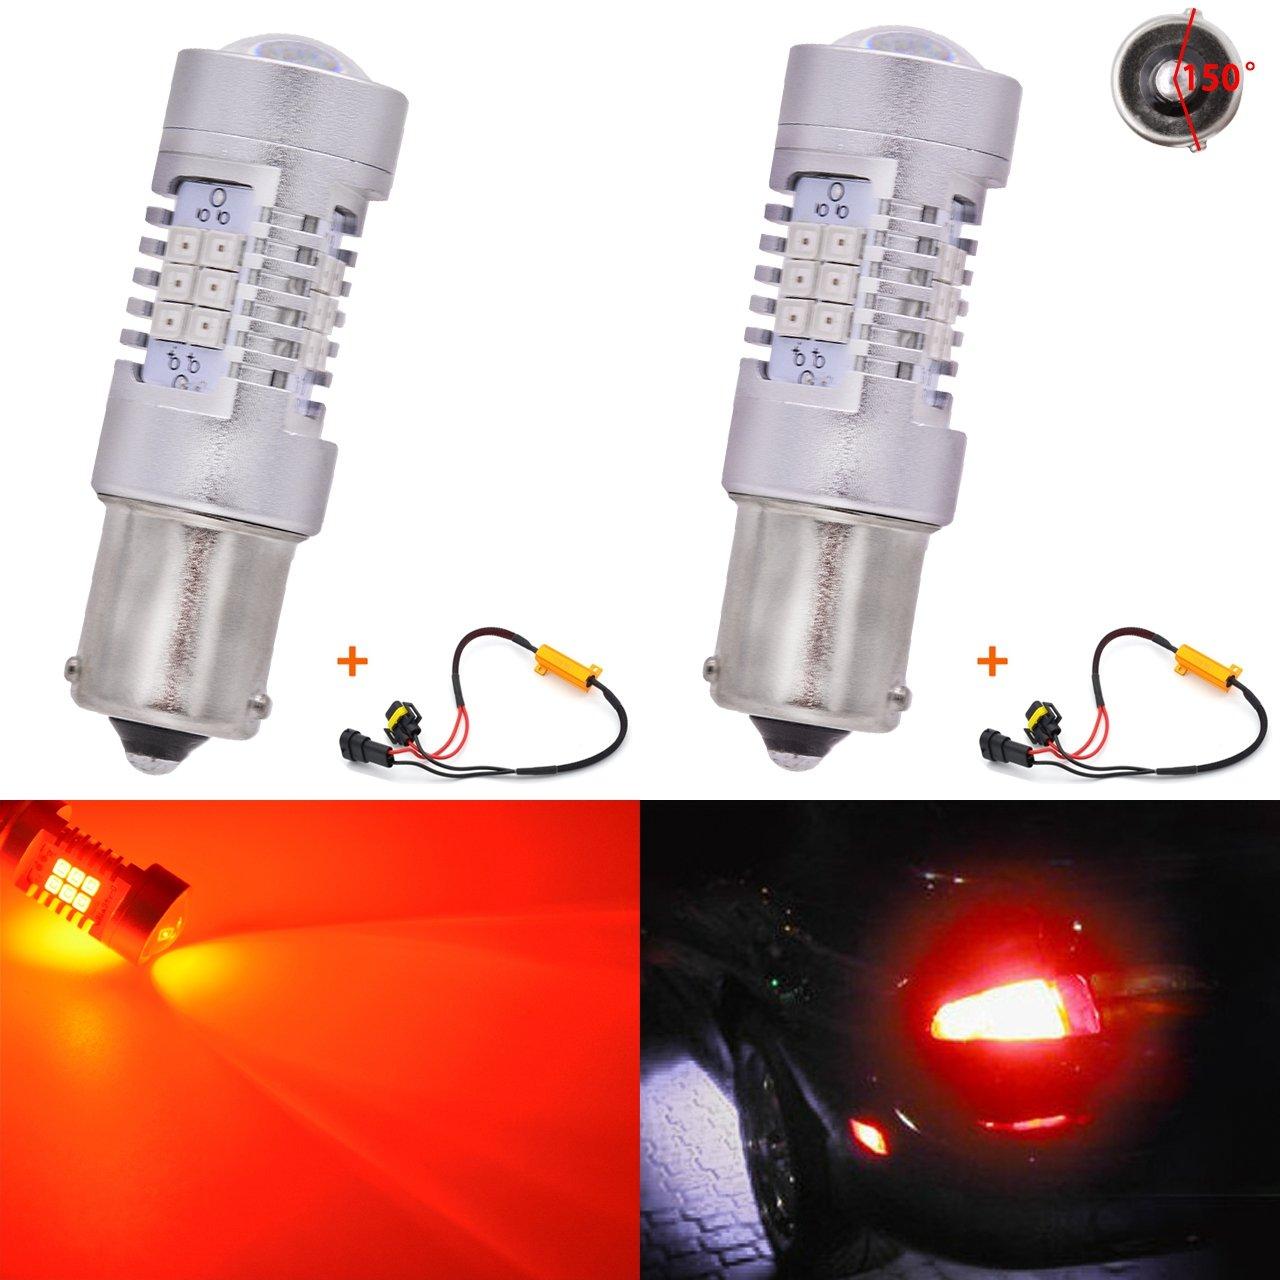 KaTur H8 H9 H11 LED Fog Light Bulbs Max 80W High Power Super Bright 2000 Lumens 3000K Amber with Projector for Driving Daytime Running Lights DRL or Fog Lights,12V Pack of 2 24V